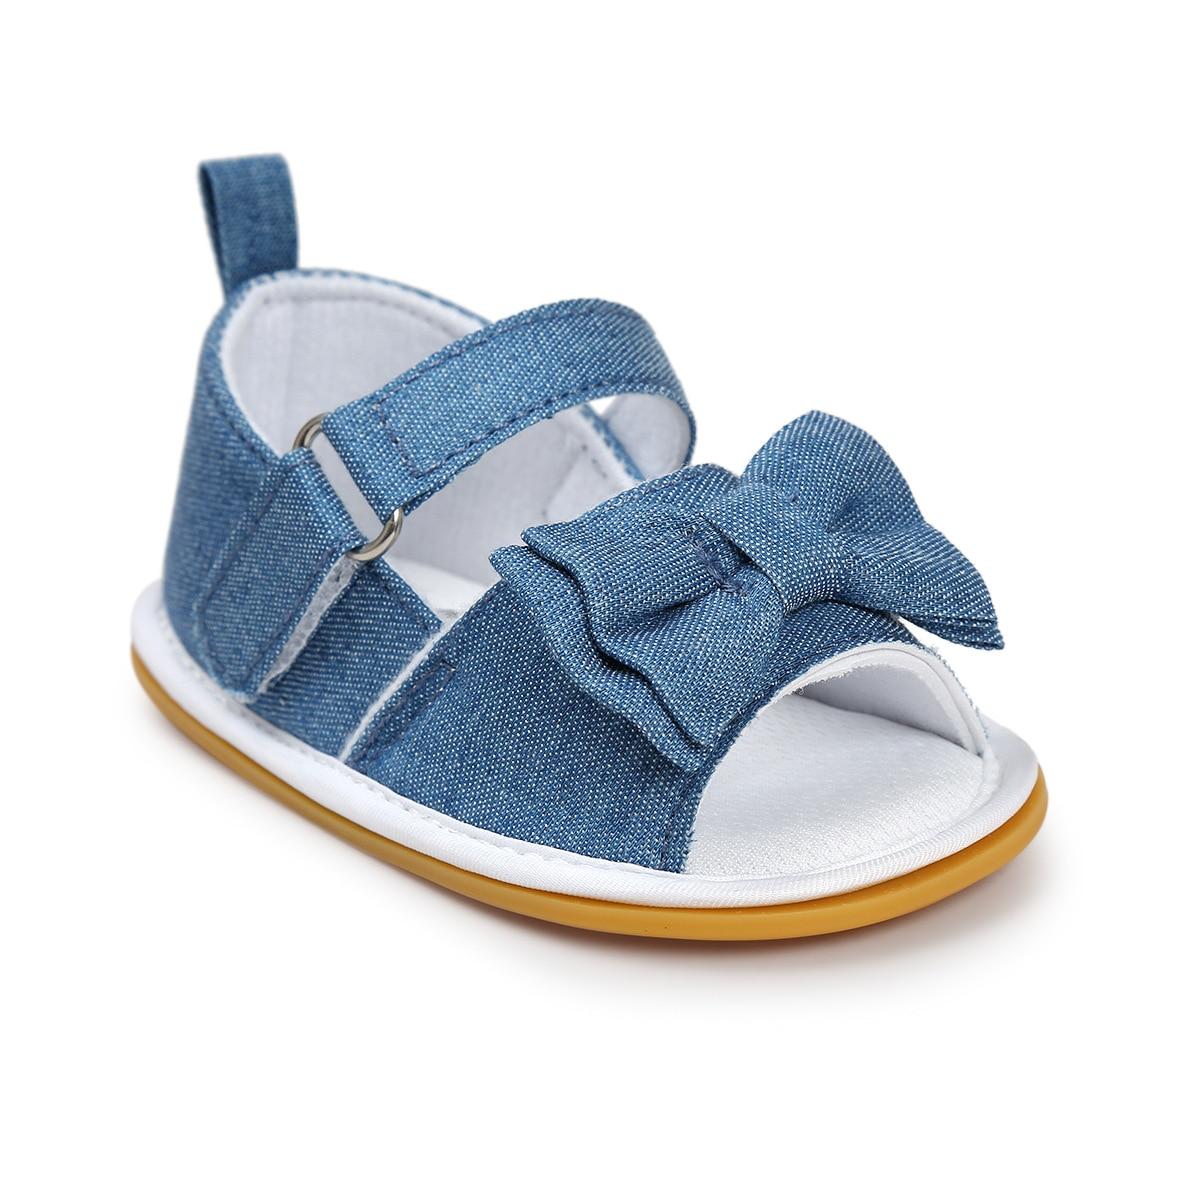 Peuter Schoenen Populaire Baby Meisjes Zomer Boog Haak Gestreepte Sandalen Antislip Soft Casual Schoenen 0-18 M Yu